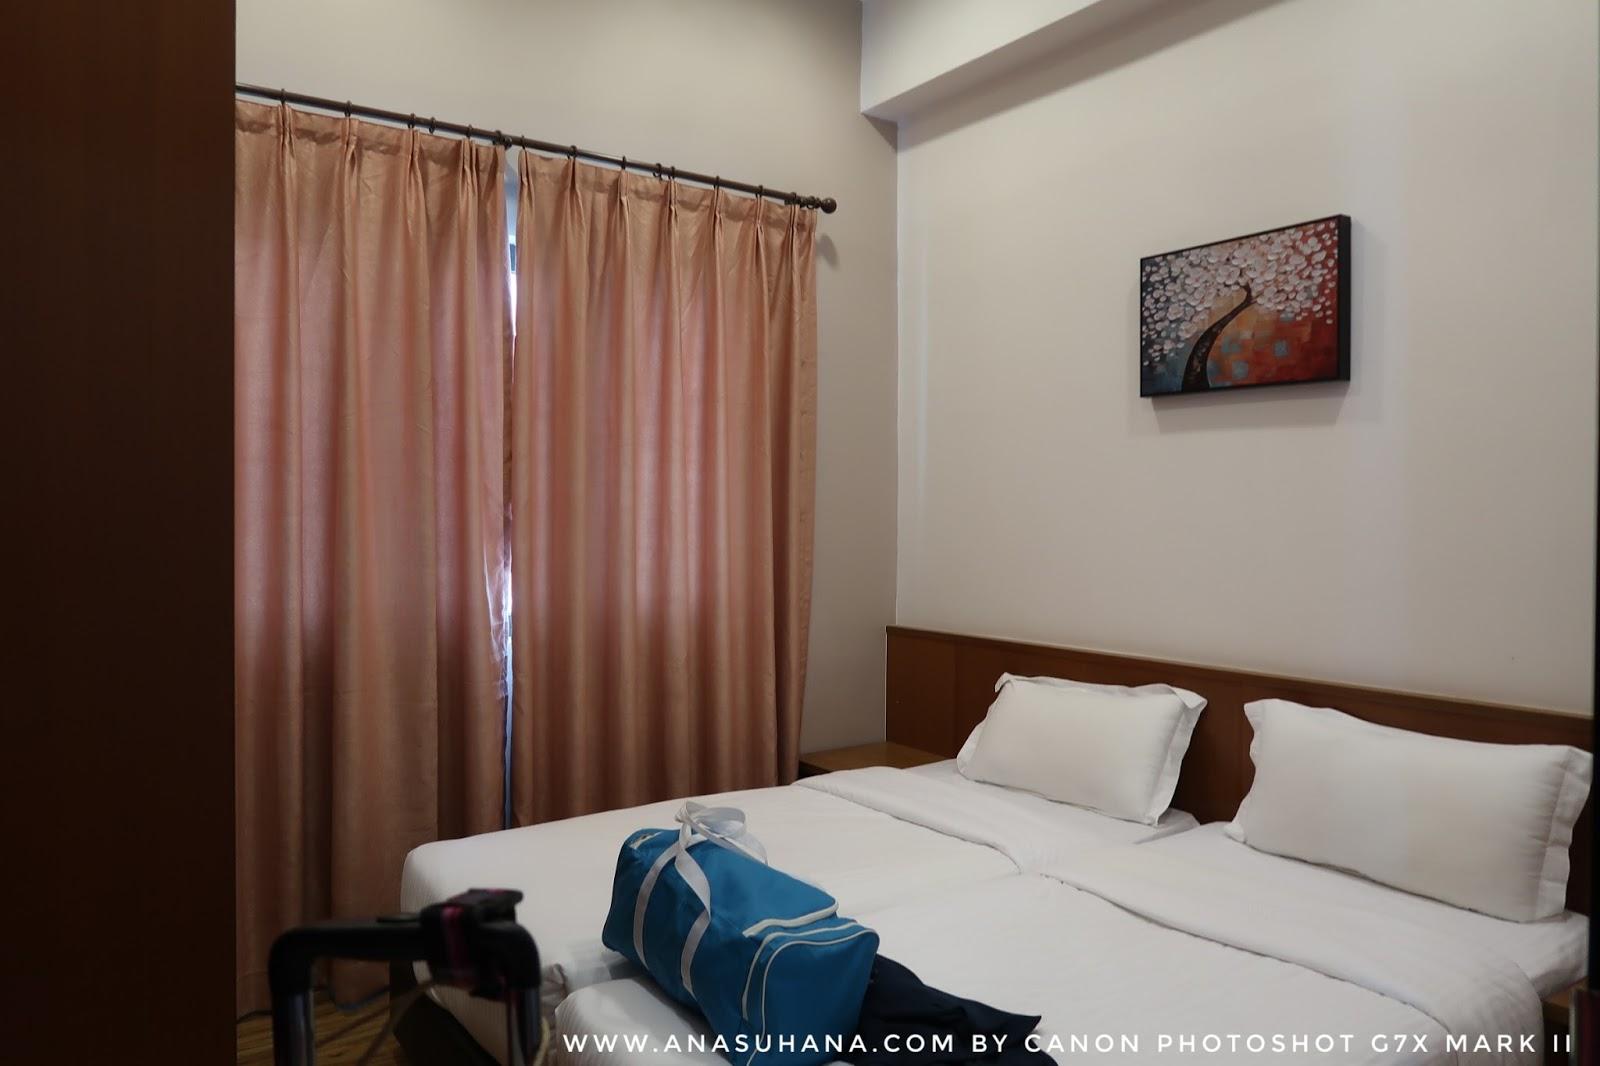 Hotel Review - The Retreat Aranda Nova